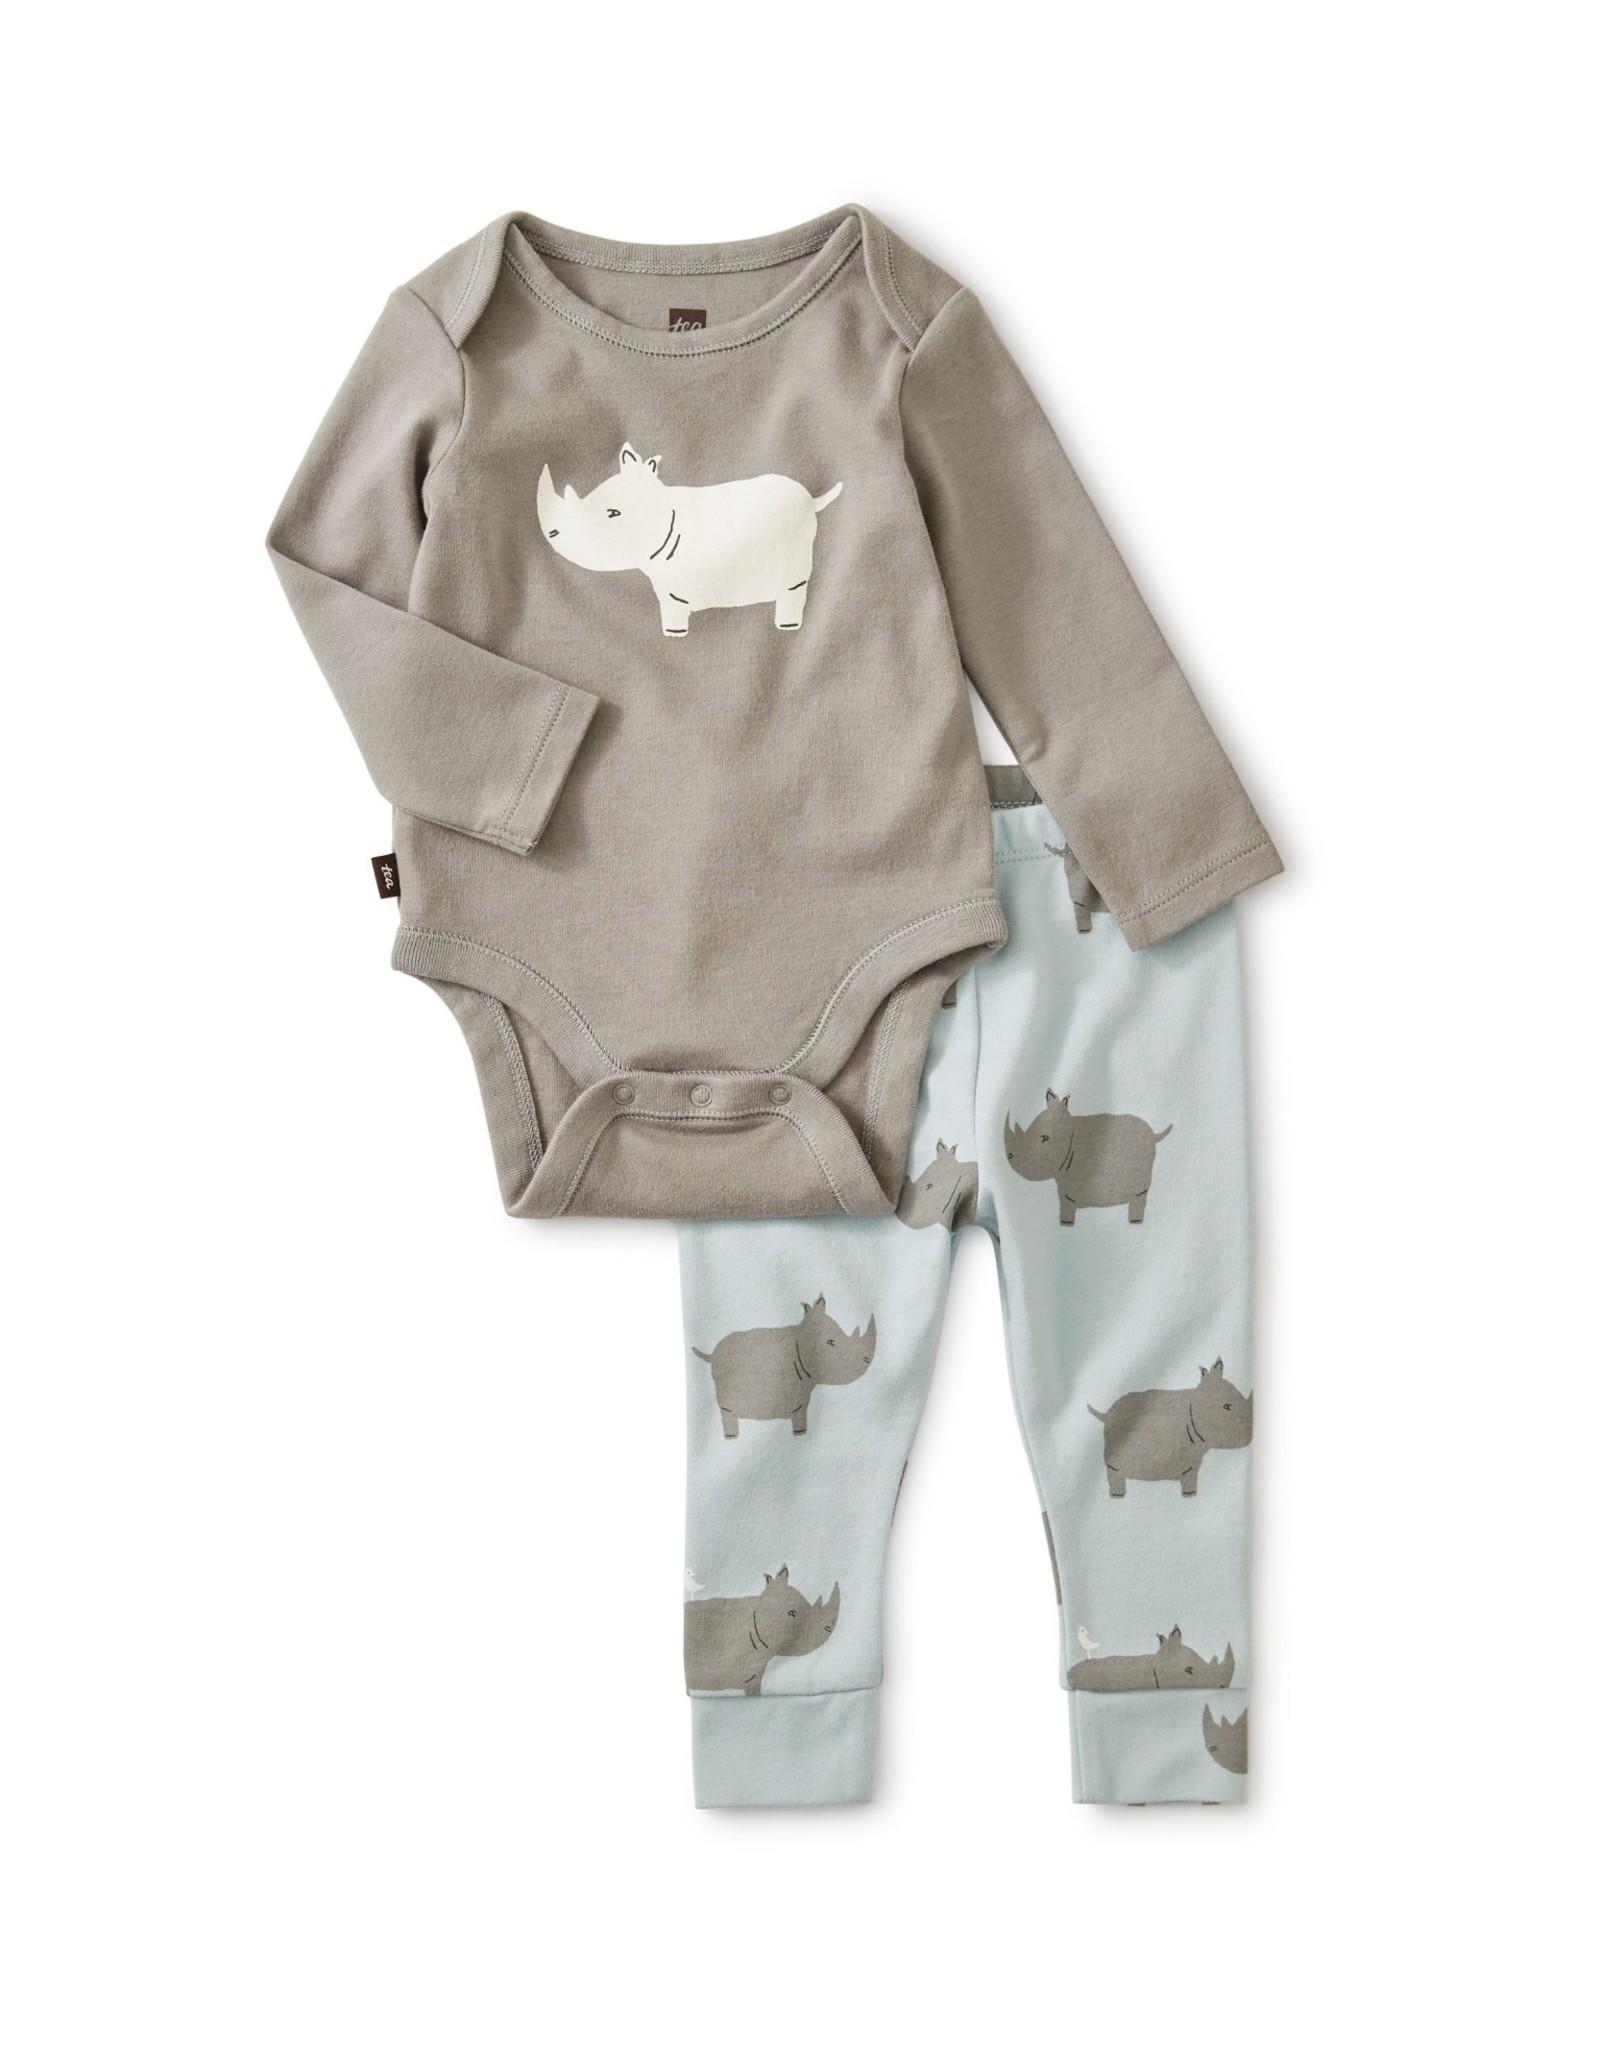 Tea 1SM20 Bodysuit Baby Outfit